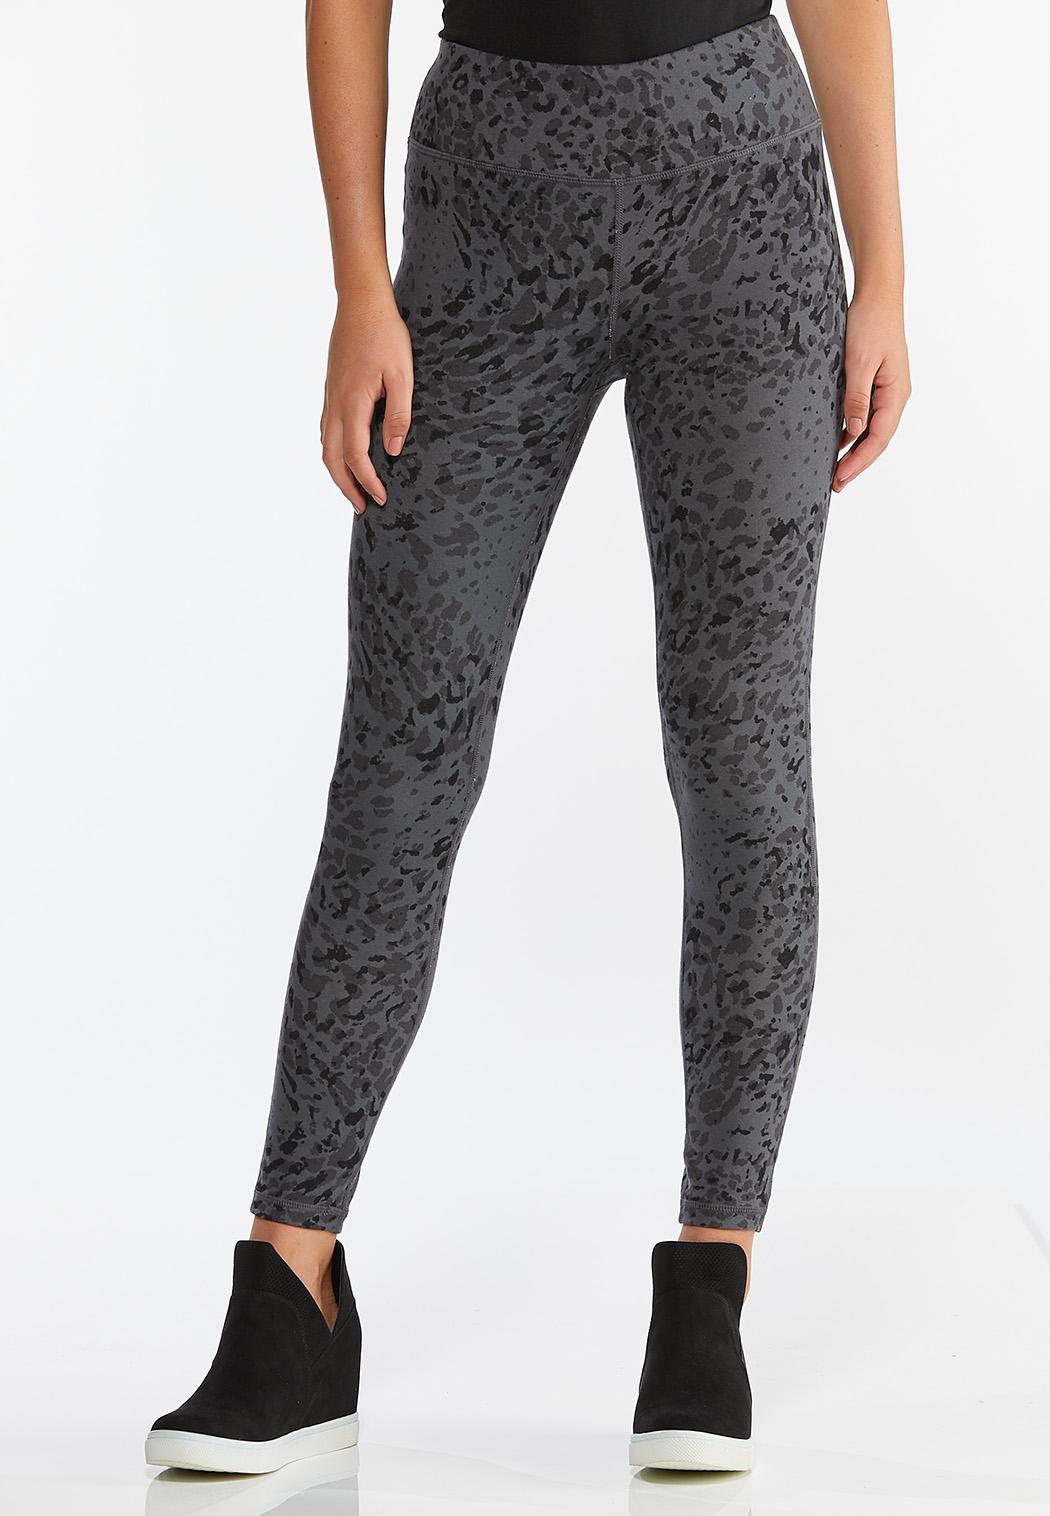 Gray Leopard Leggings